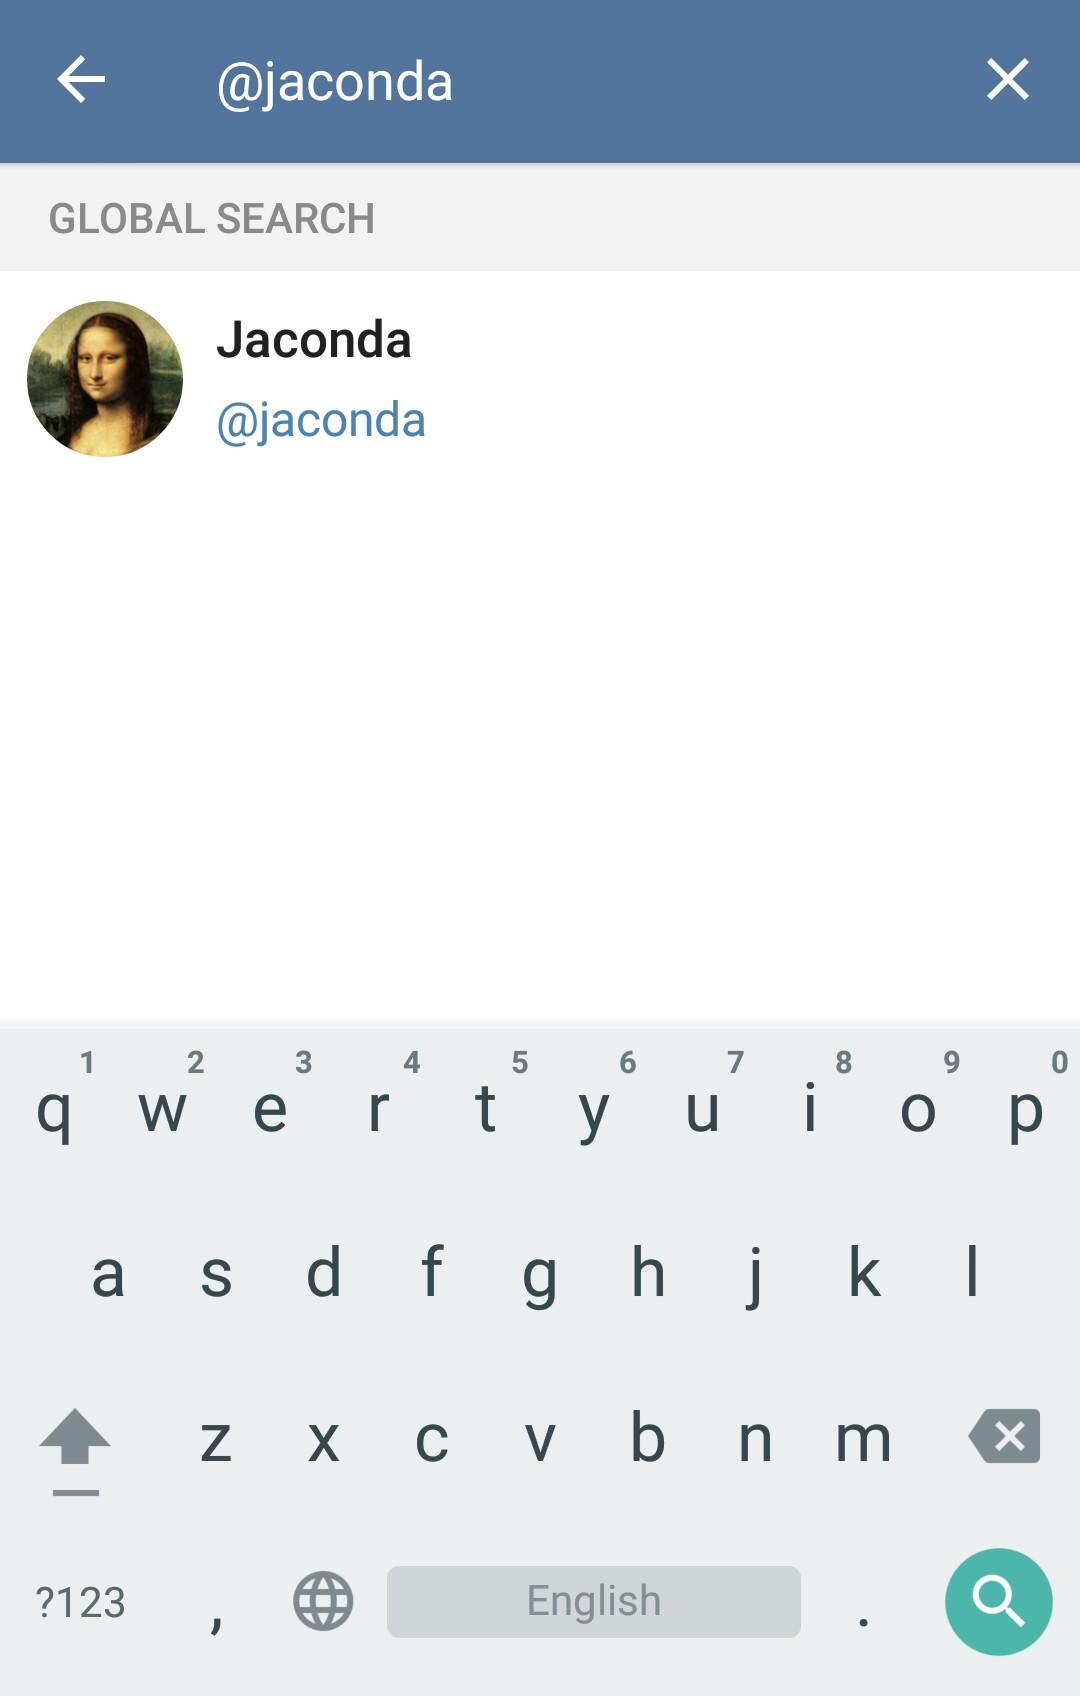 jaconda